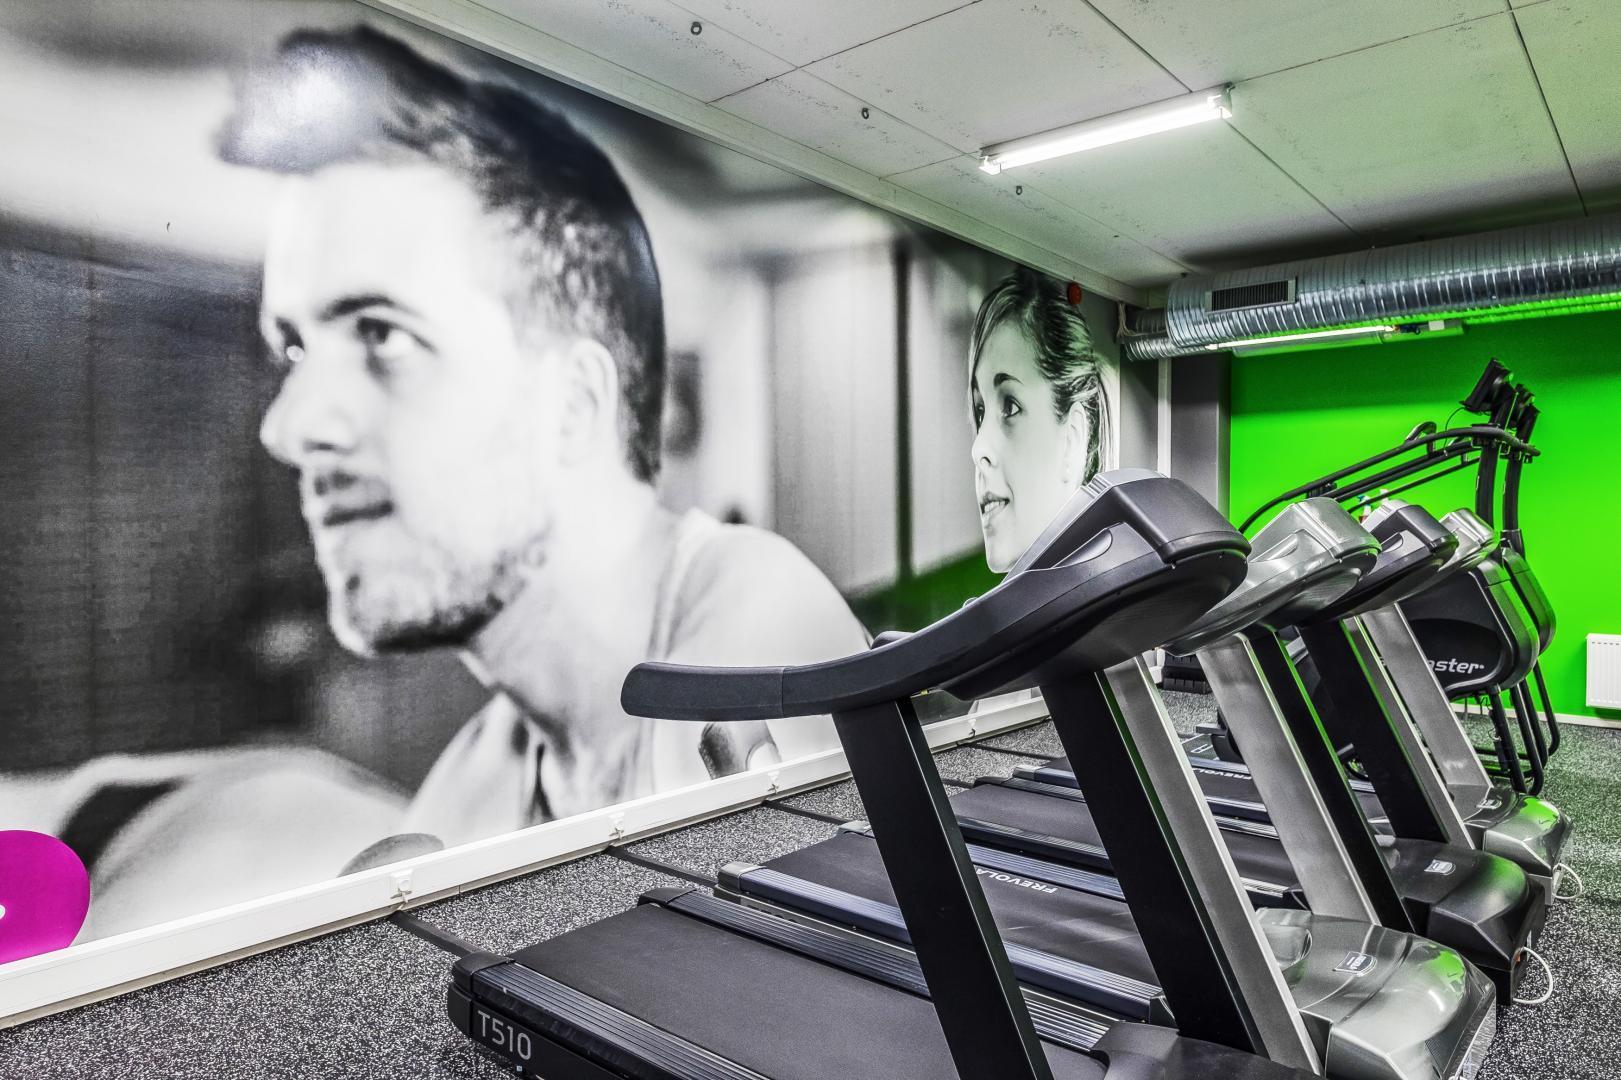 fitnesspoint-jarlso-header-image